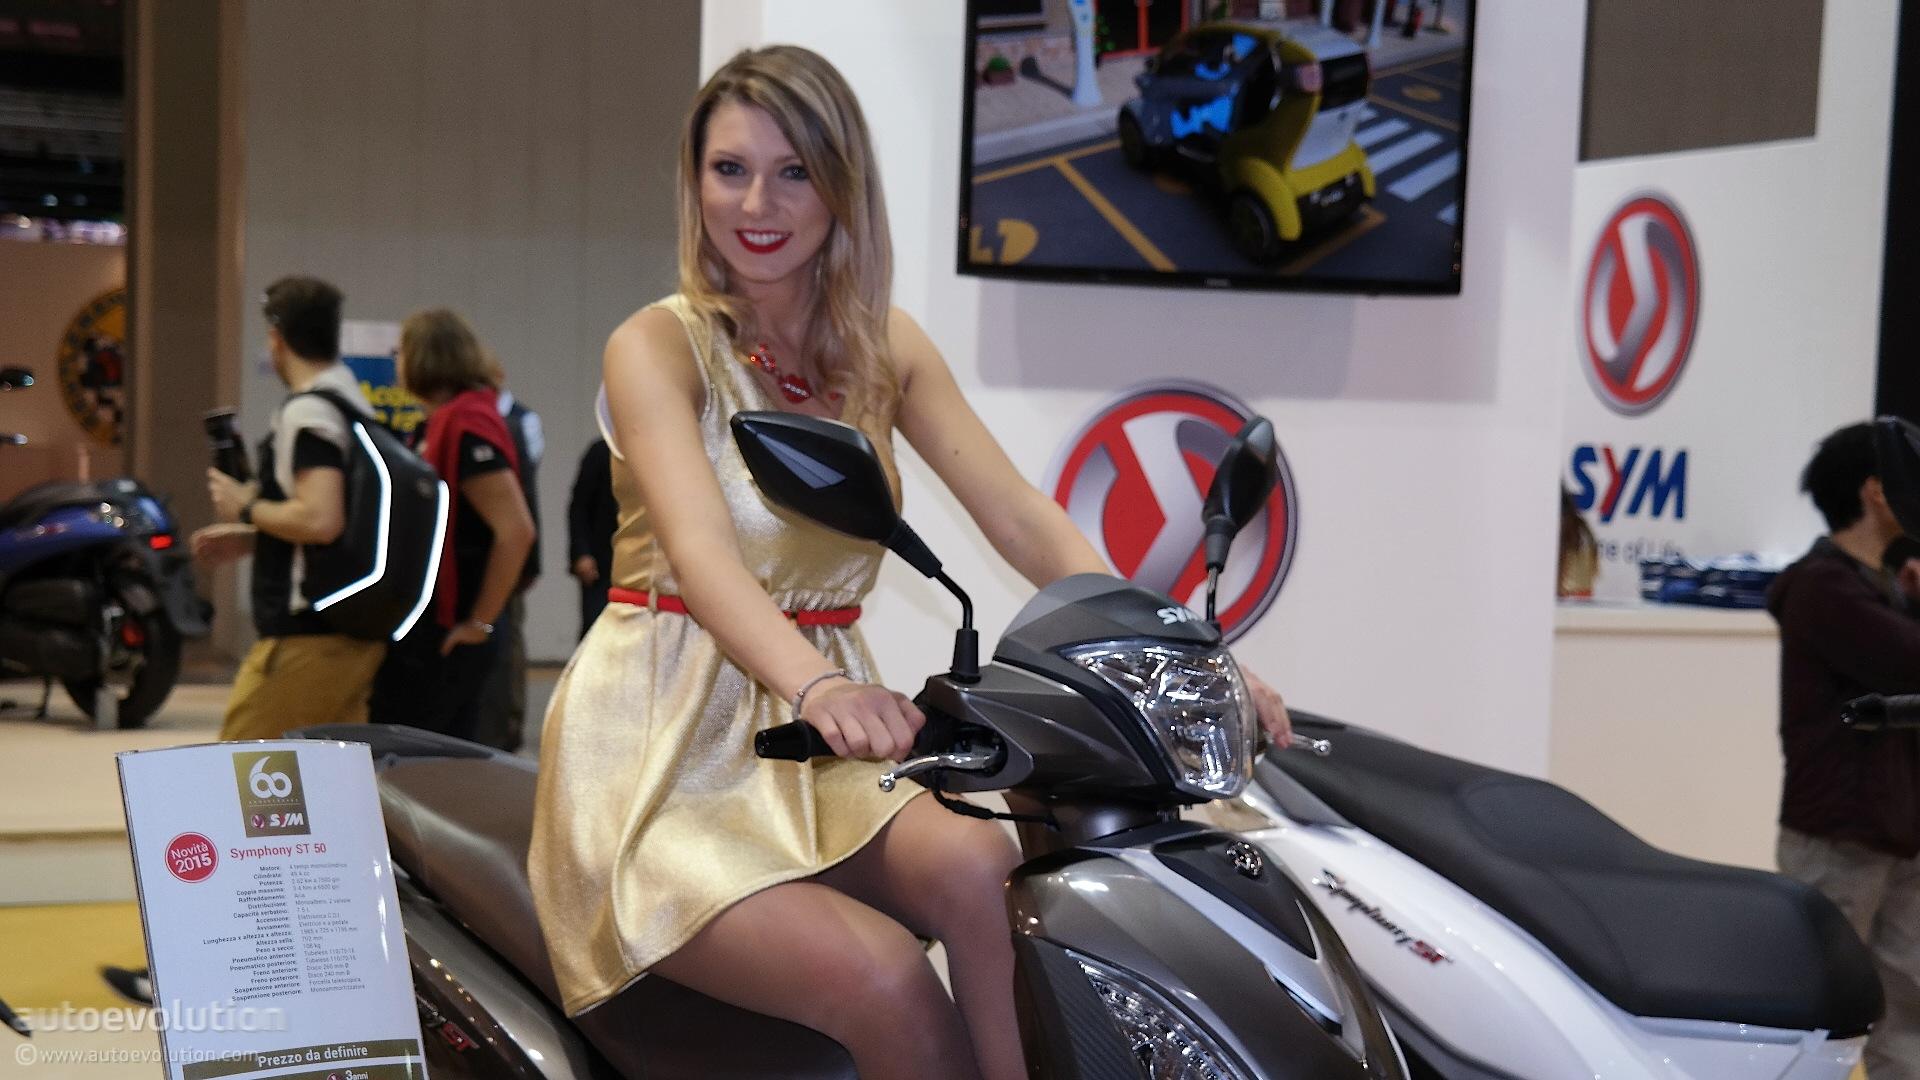 Kia Car Company Stand On Women S Rights